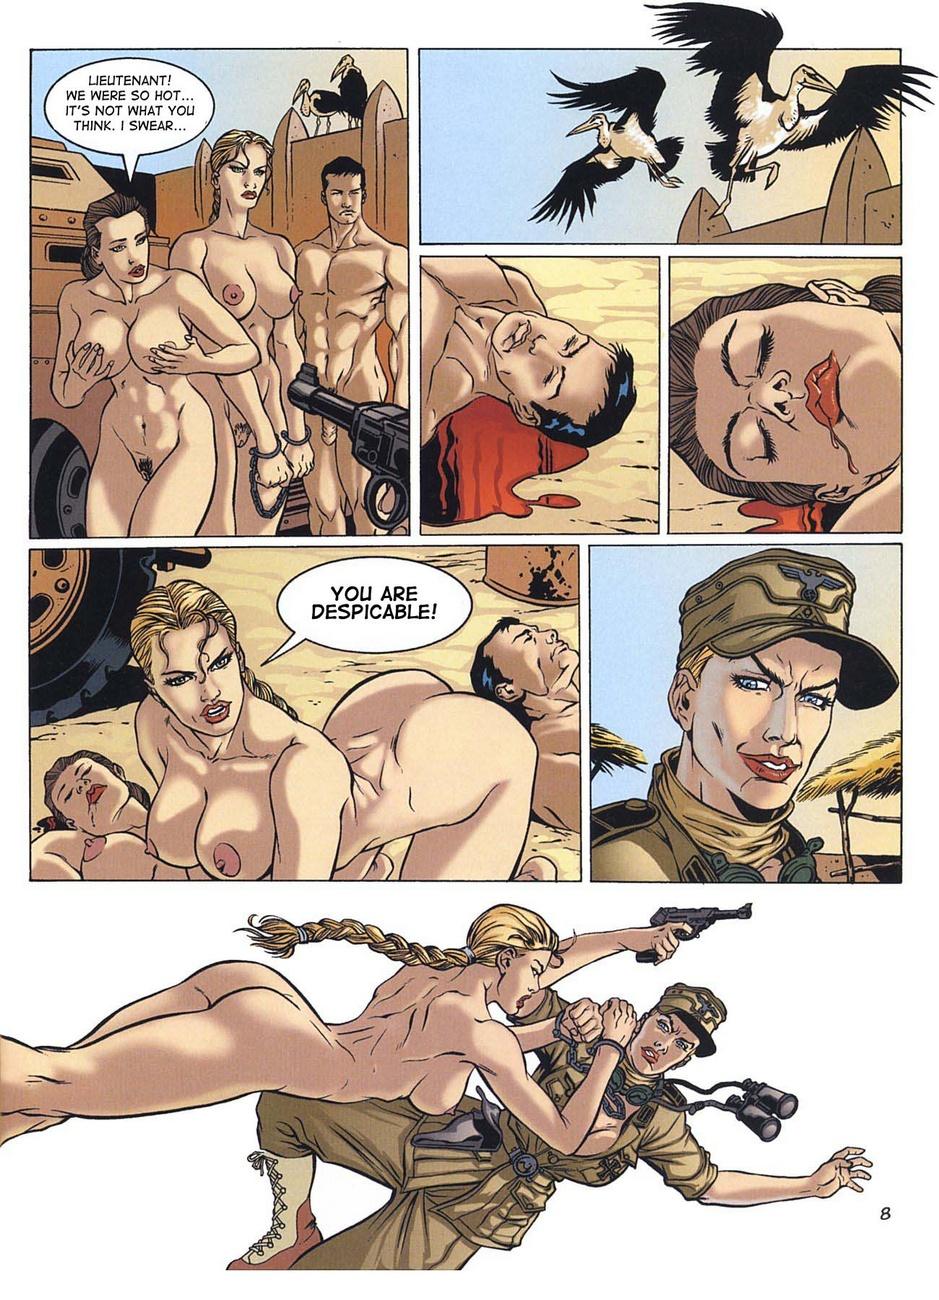 Lara Jones 1 - The Amazons